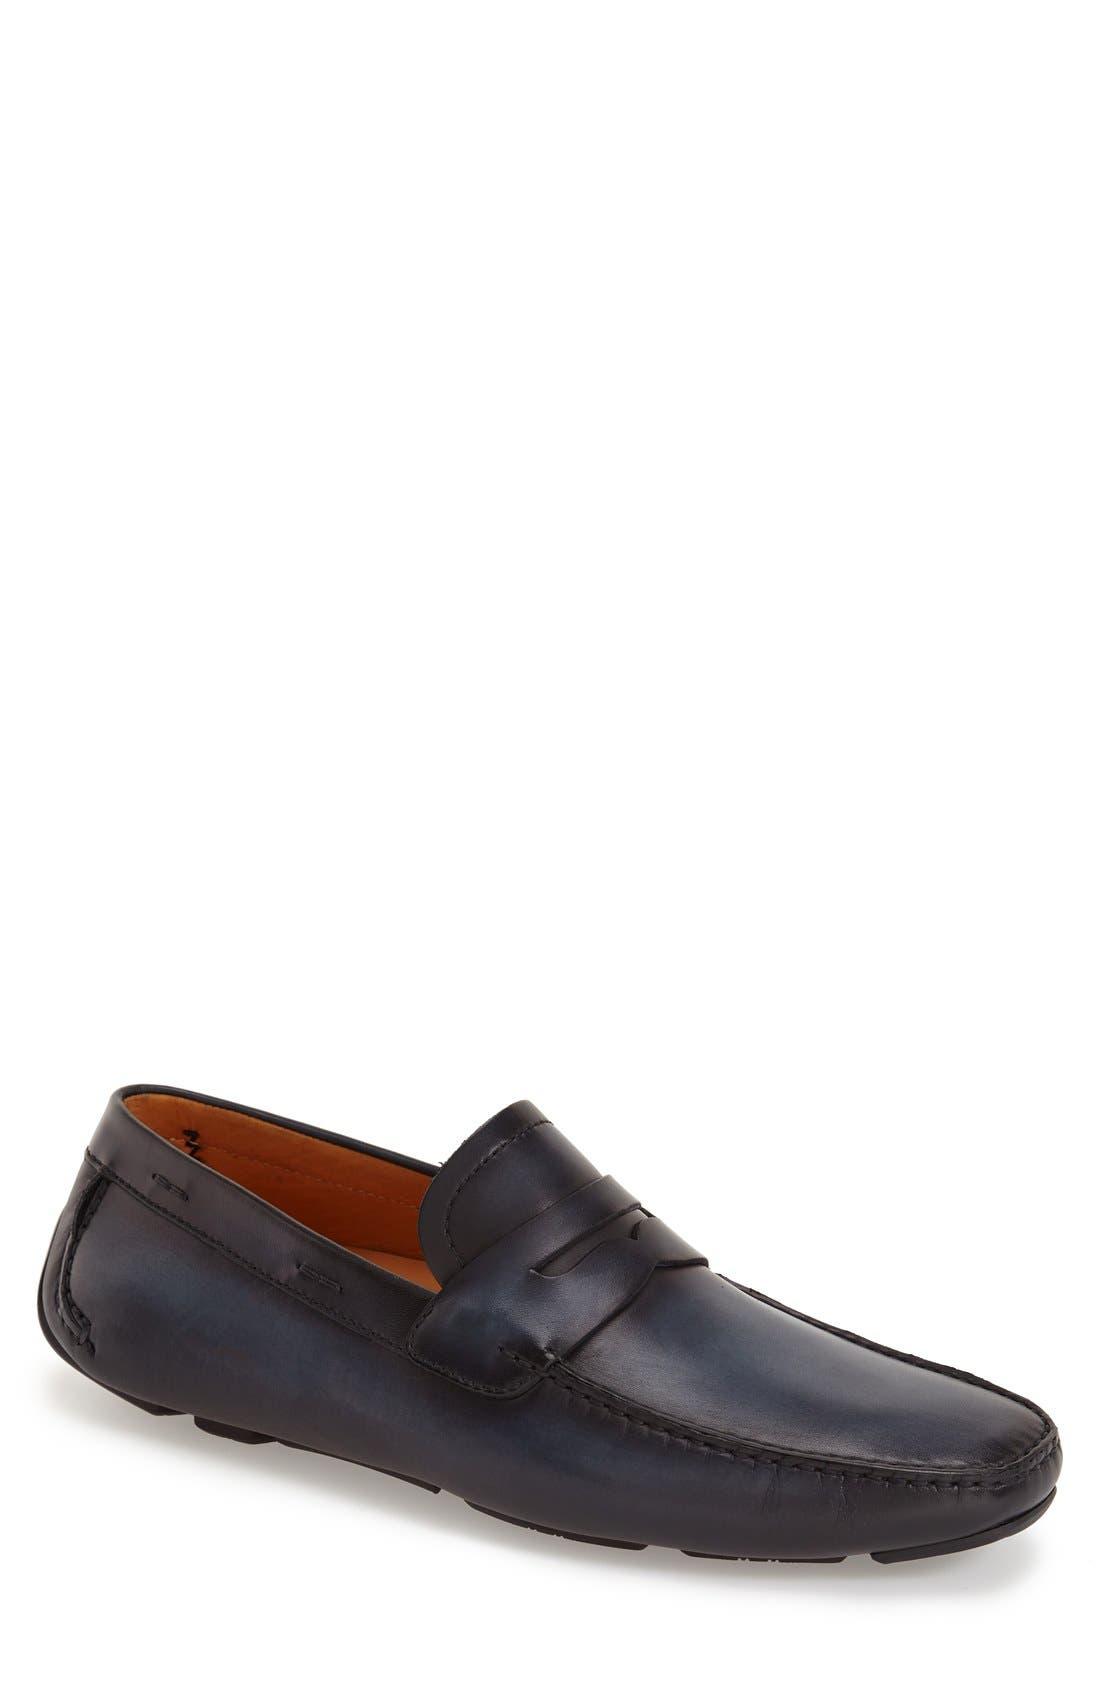 Magnanni 'Dylan' Leather Driving Shoe (Men)